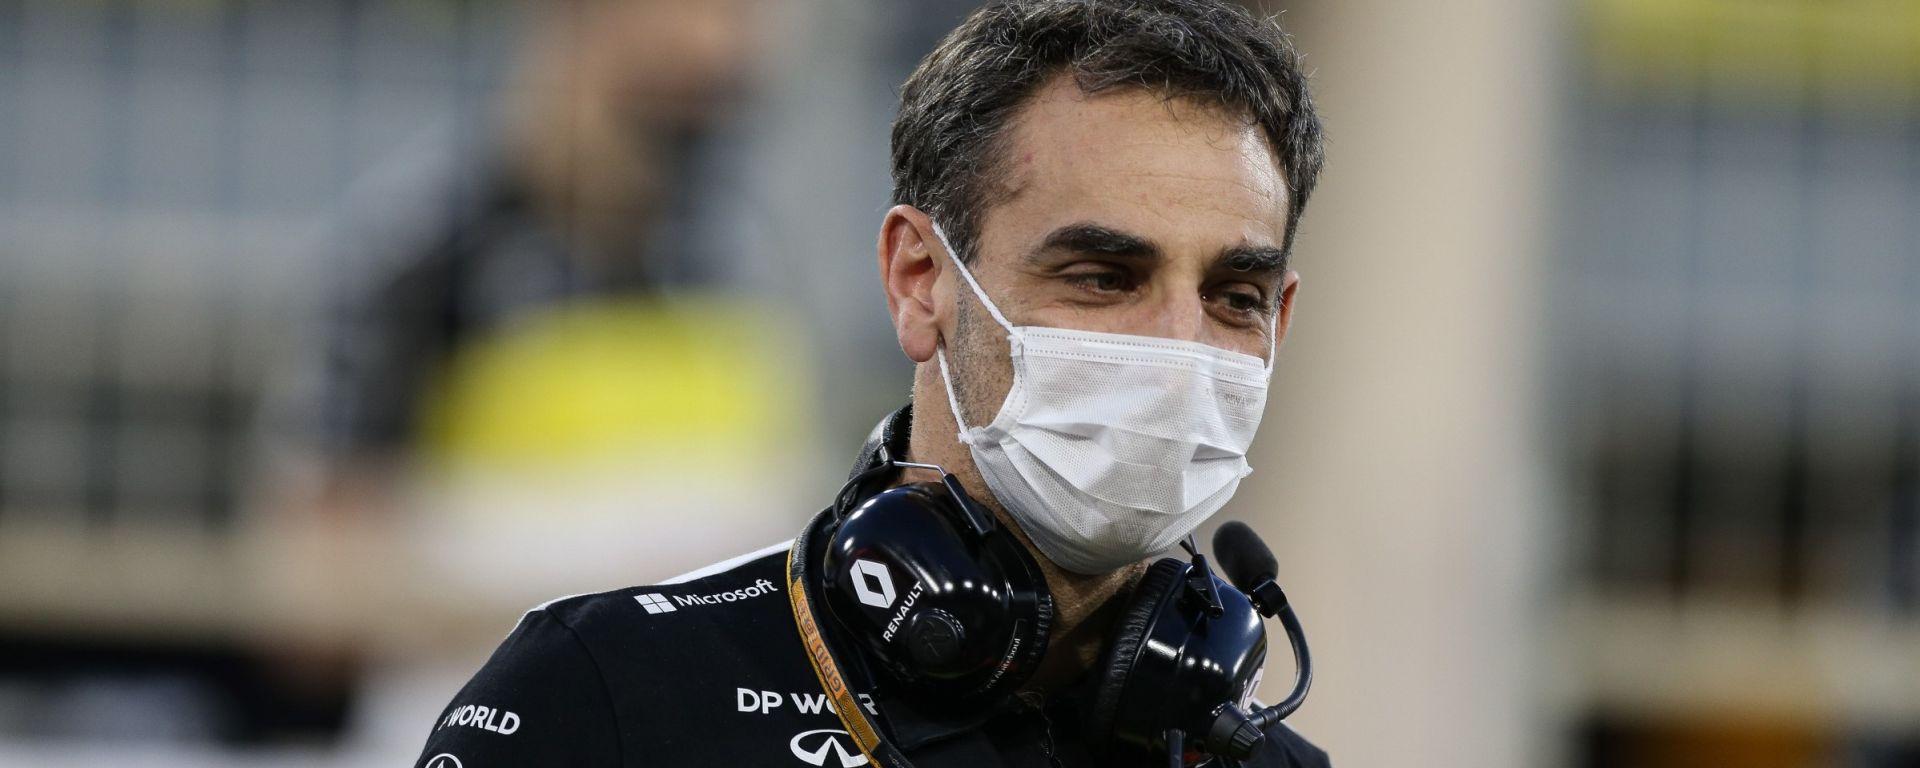 F1, GP Bahrain 2020: Cyril Abiteboul (Renault)